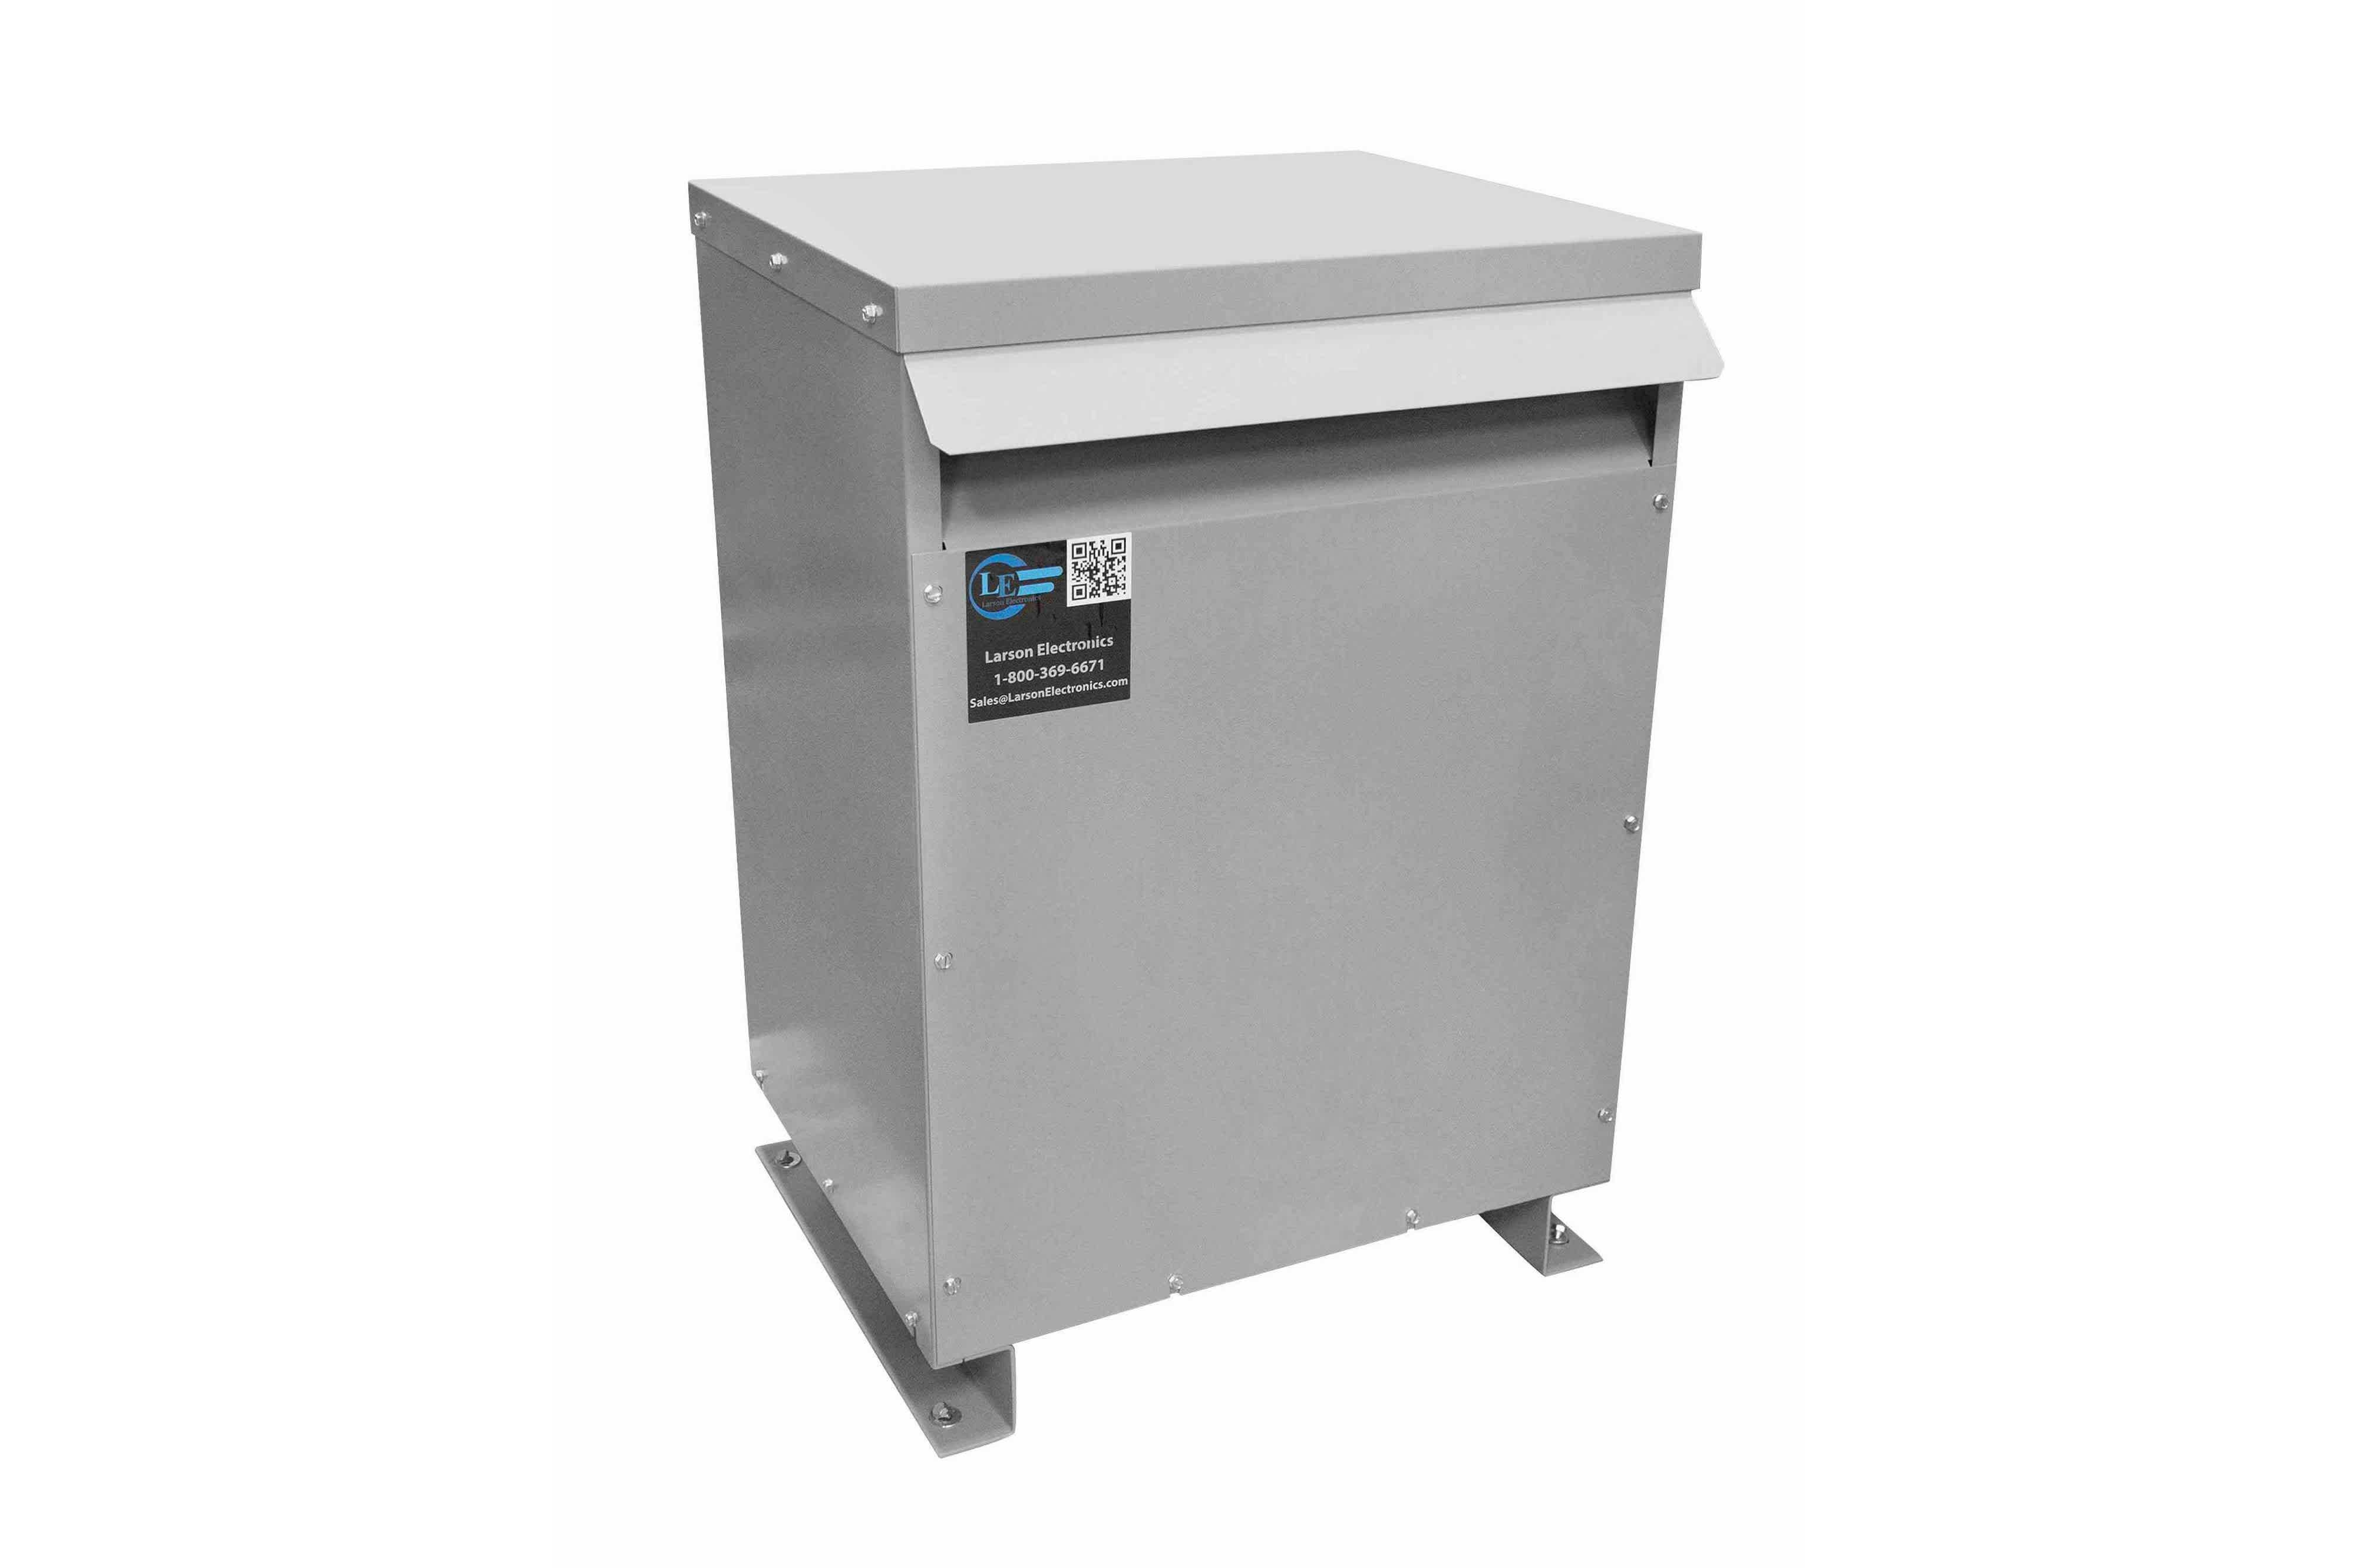 150 kVA 3PH DOE Transformer, 480V Delta Primary, 400Y/231 Wye-N Secondary, N3R, Ventilated, 60 Hz